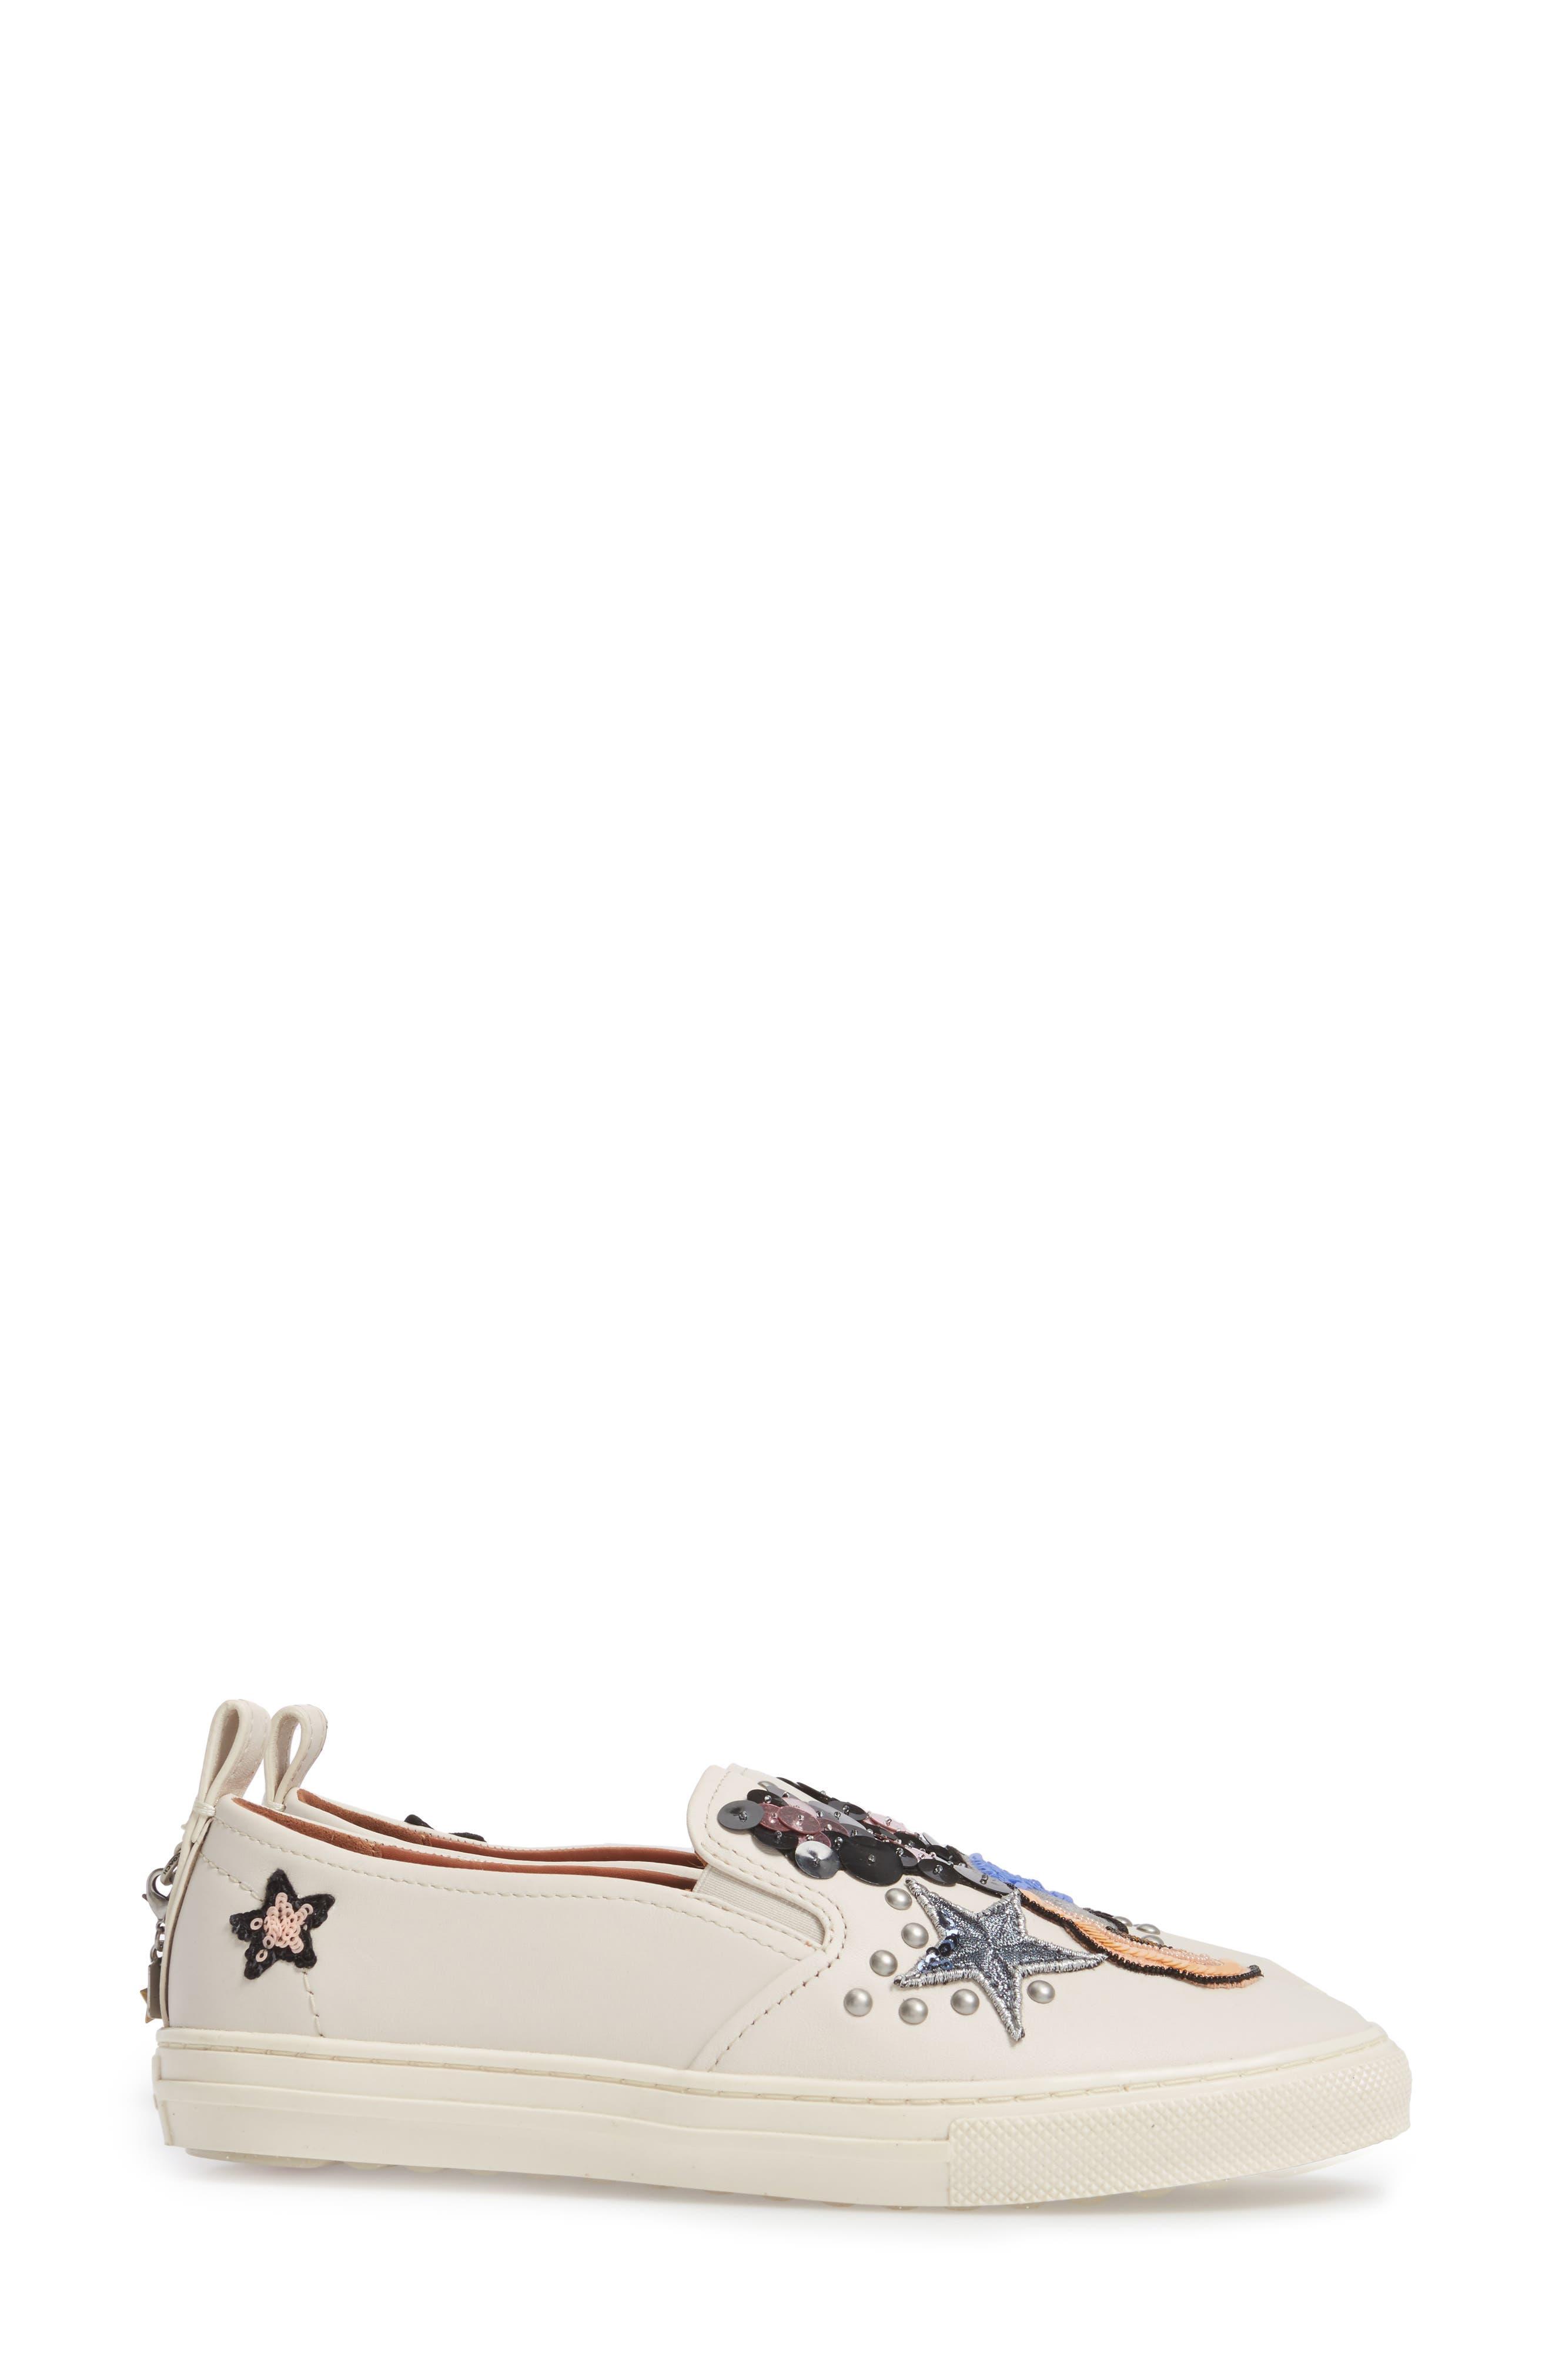 Star Patch Slip-On Sneaker,                             Alternate thumbnail 3, color,                             Chalk Leather